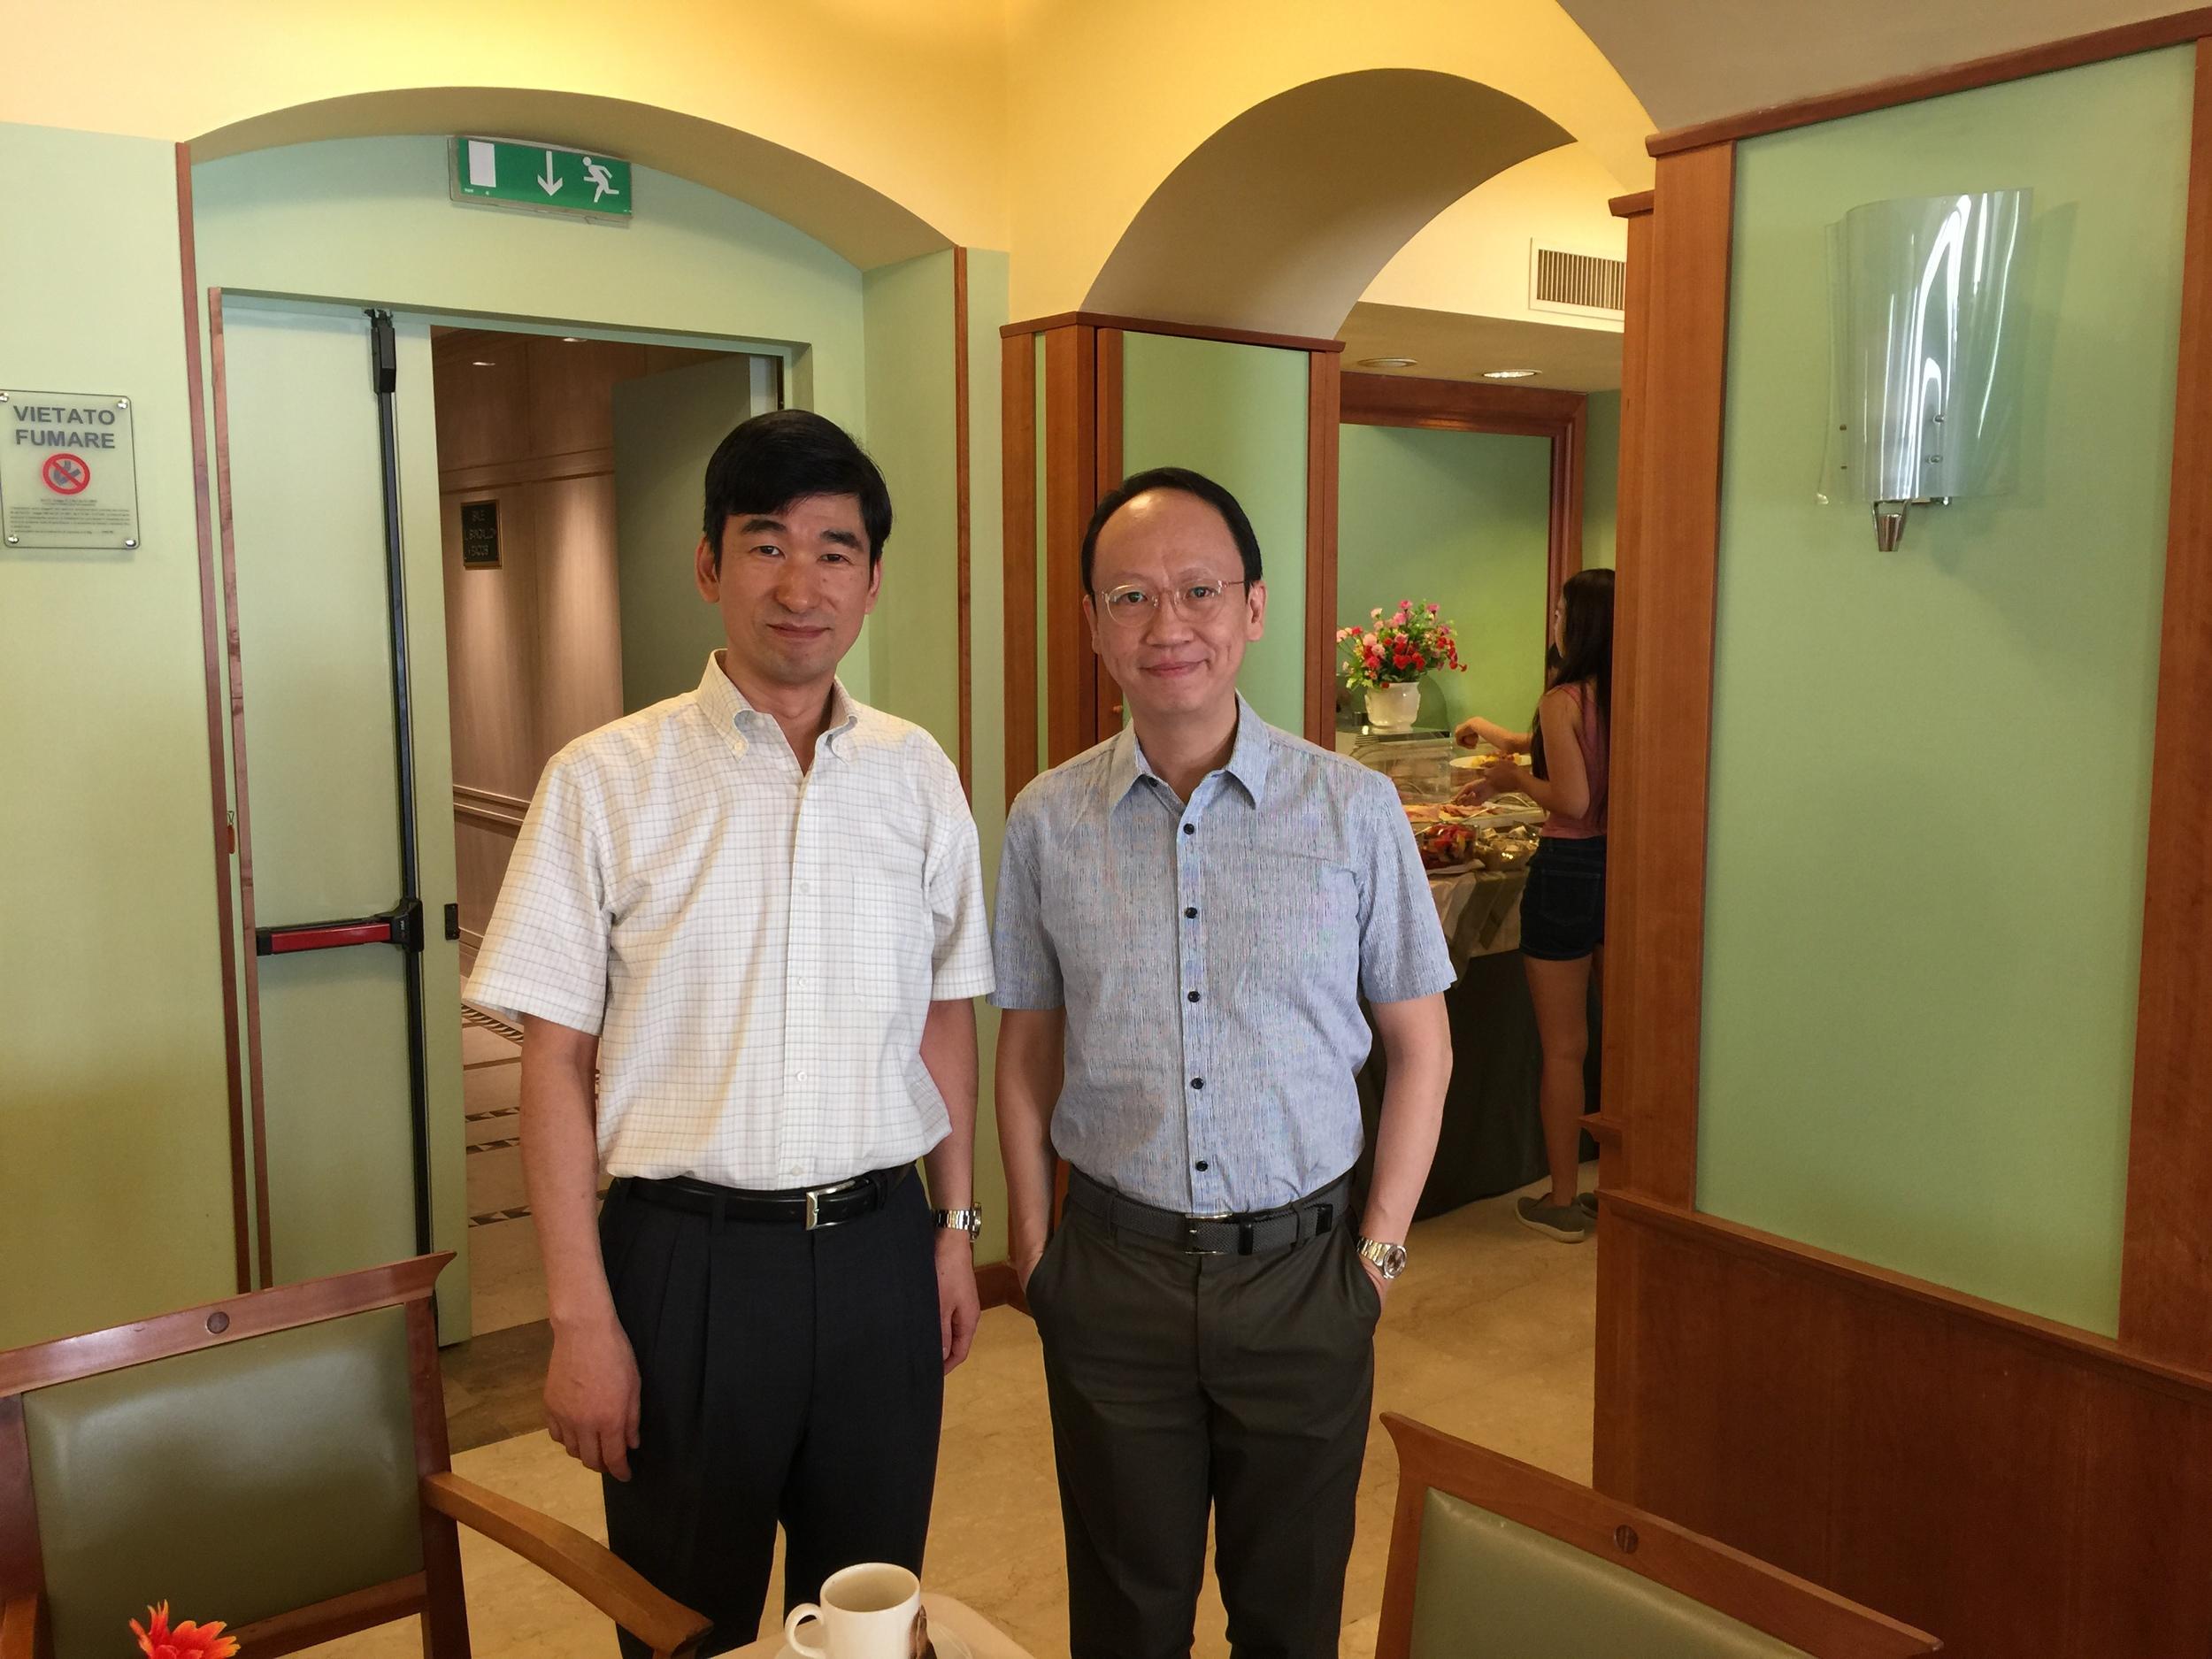 With fellow professor, Masahiro Kawakami from Japan